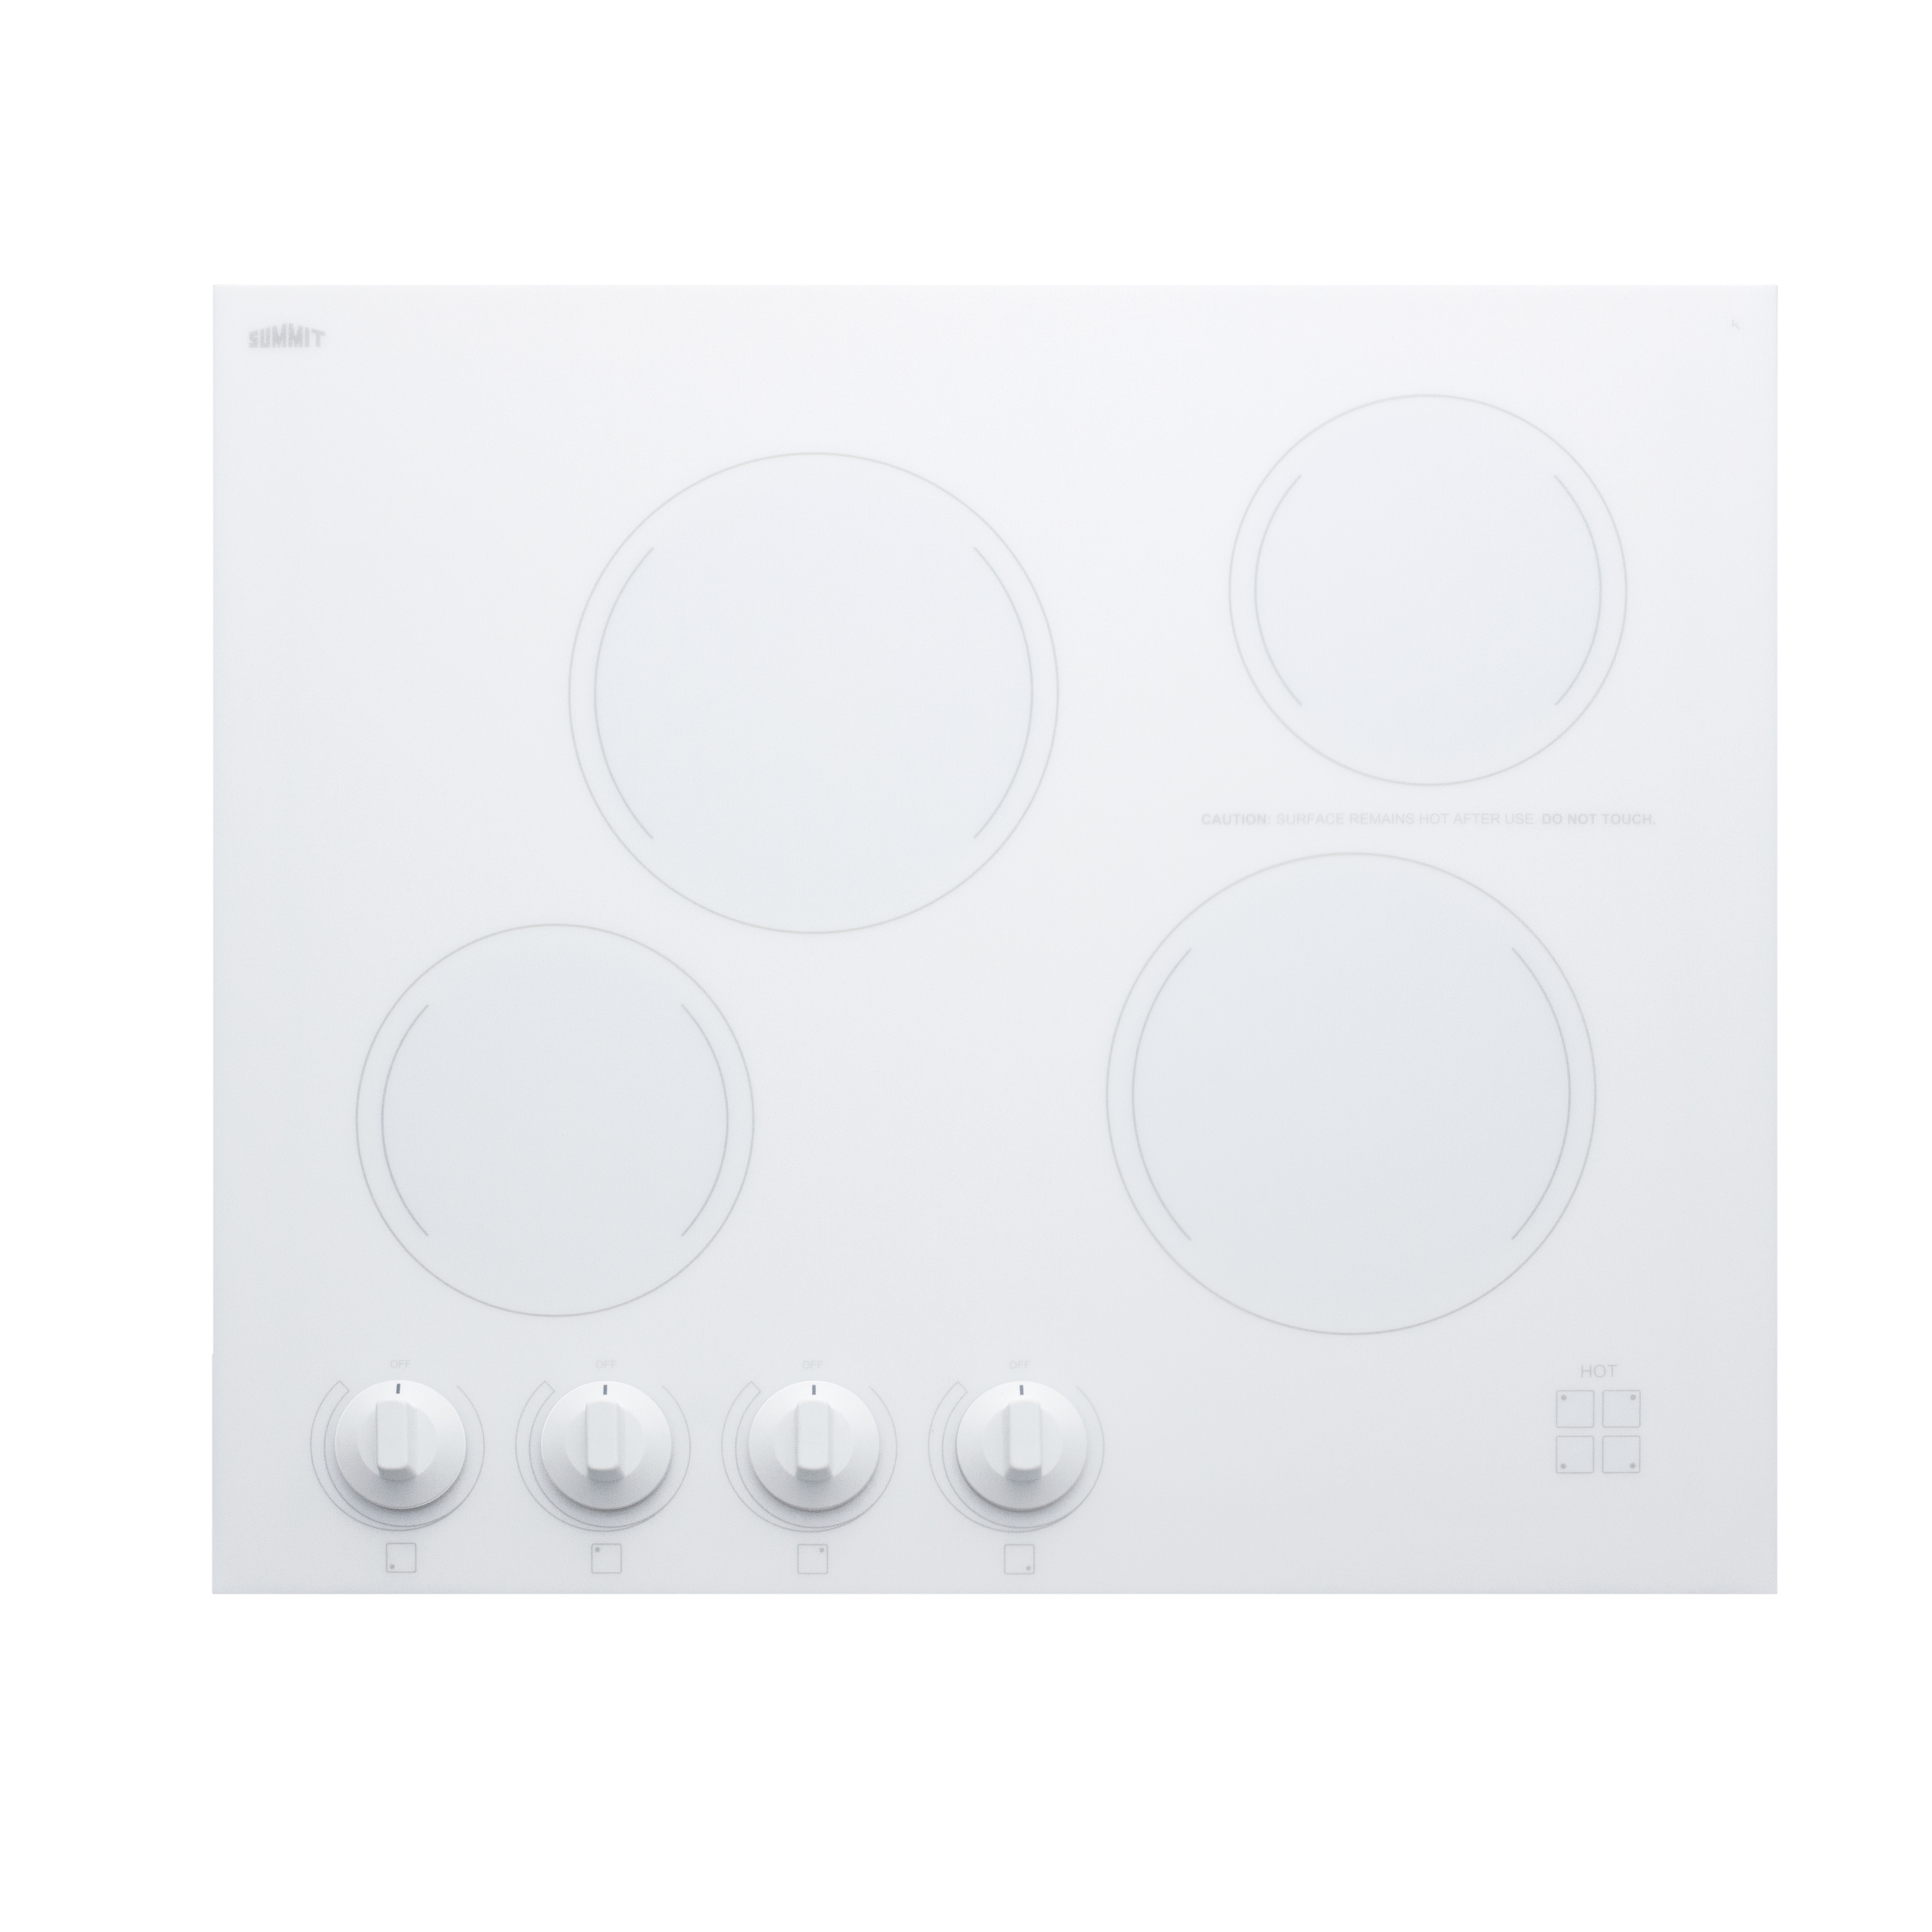 Summit Appliance CREK4W hotplate, built-in, electric